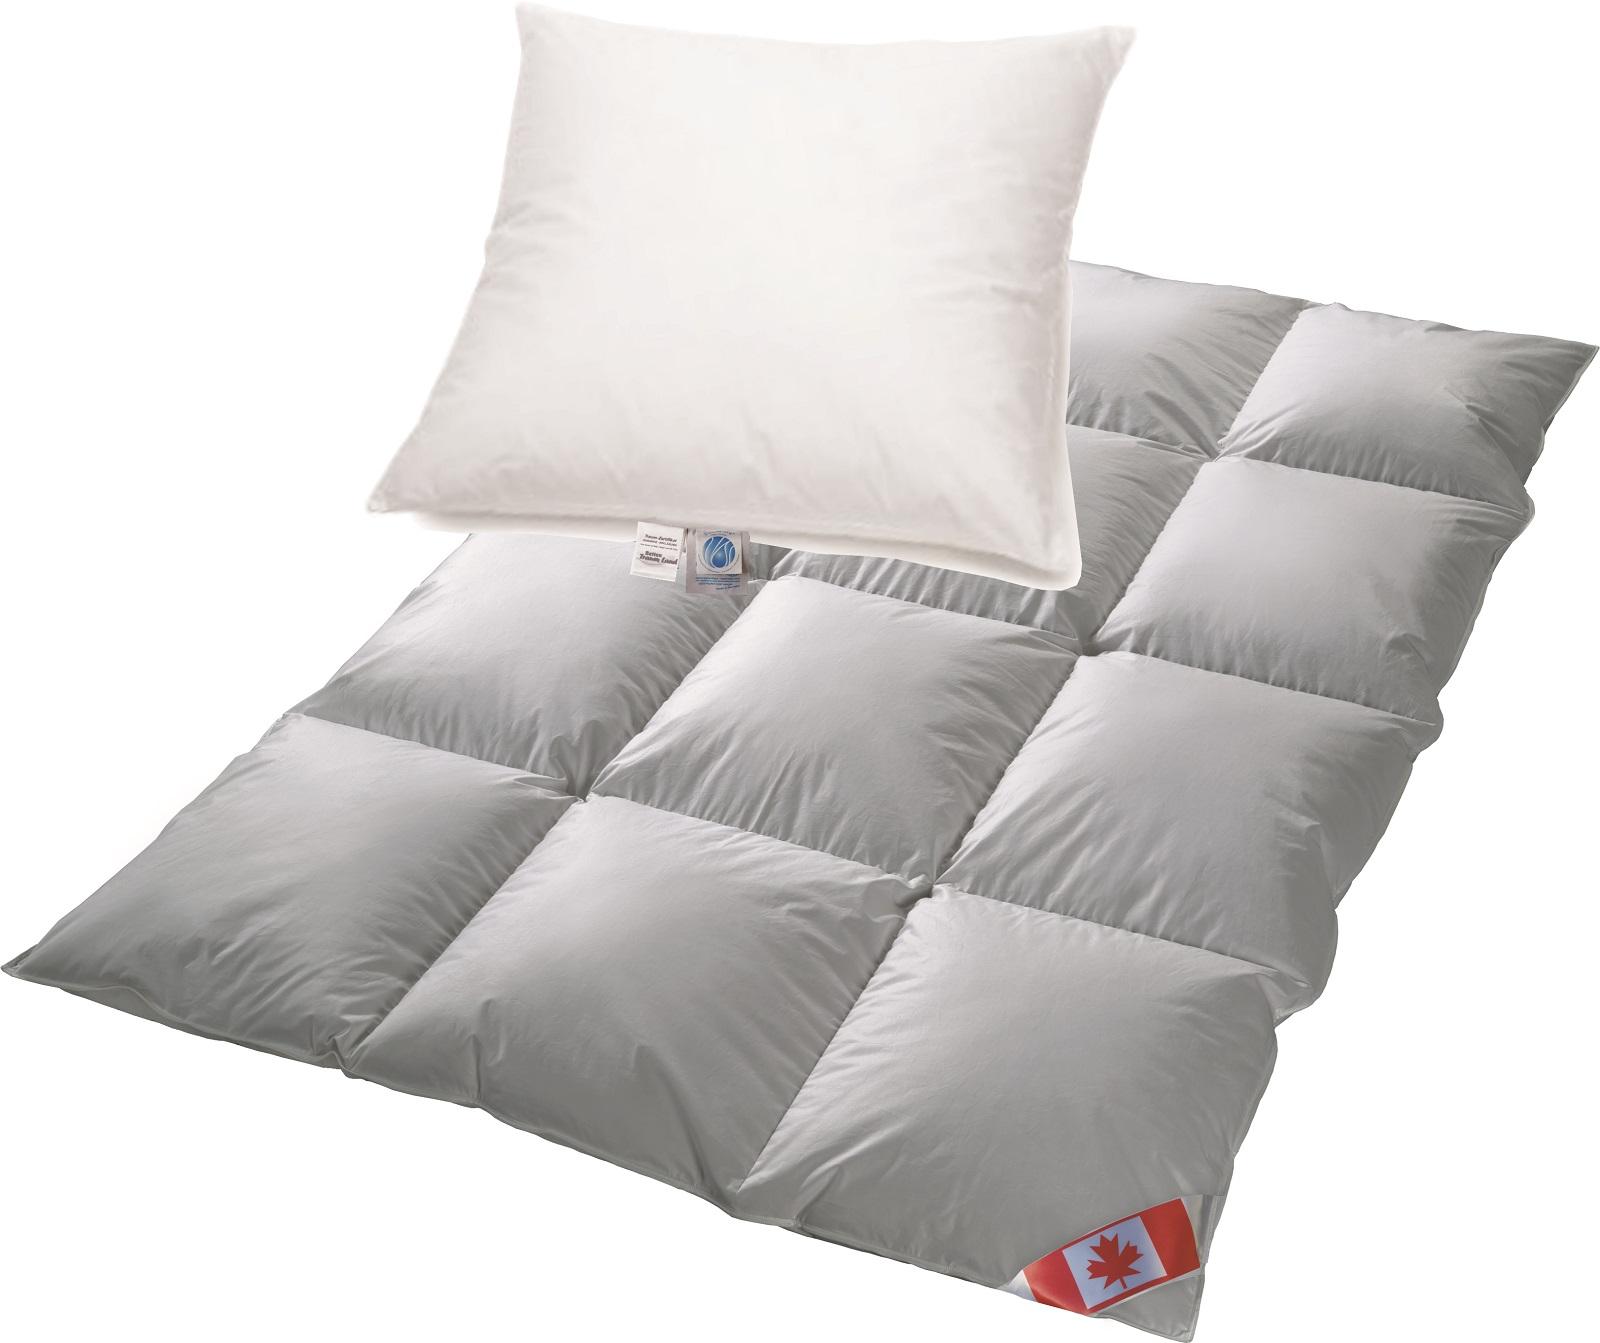 Set Canada EXTRA warme Winterdecke R5 100%Daune 135x200 + Kissen ARKTIC 80x80